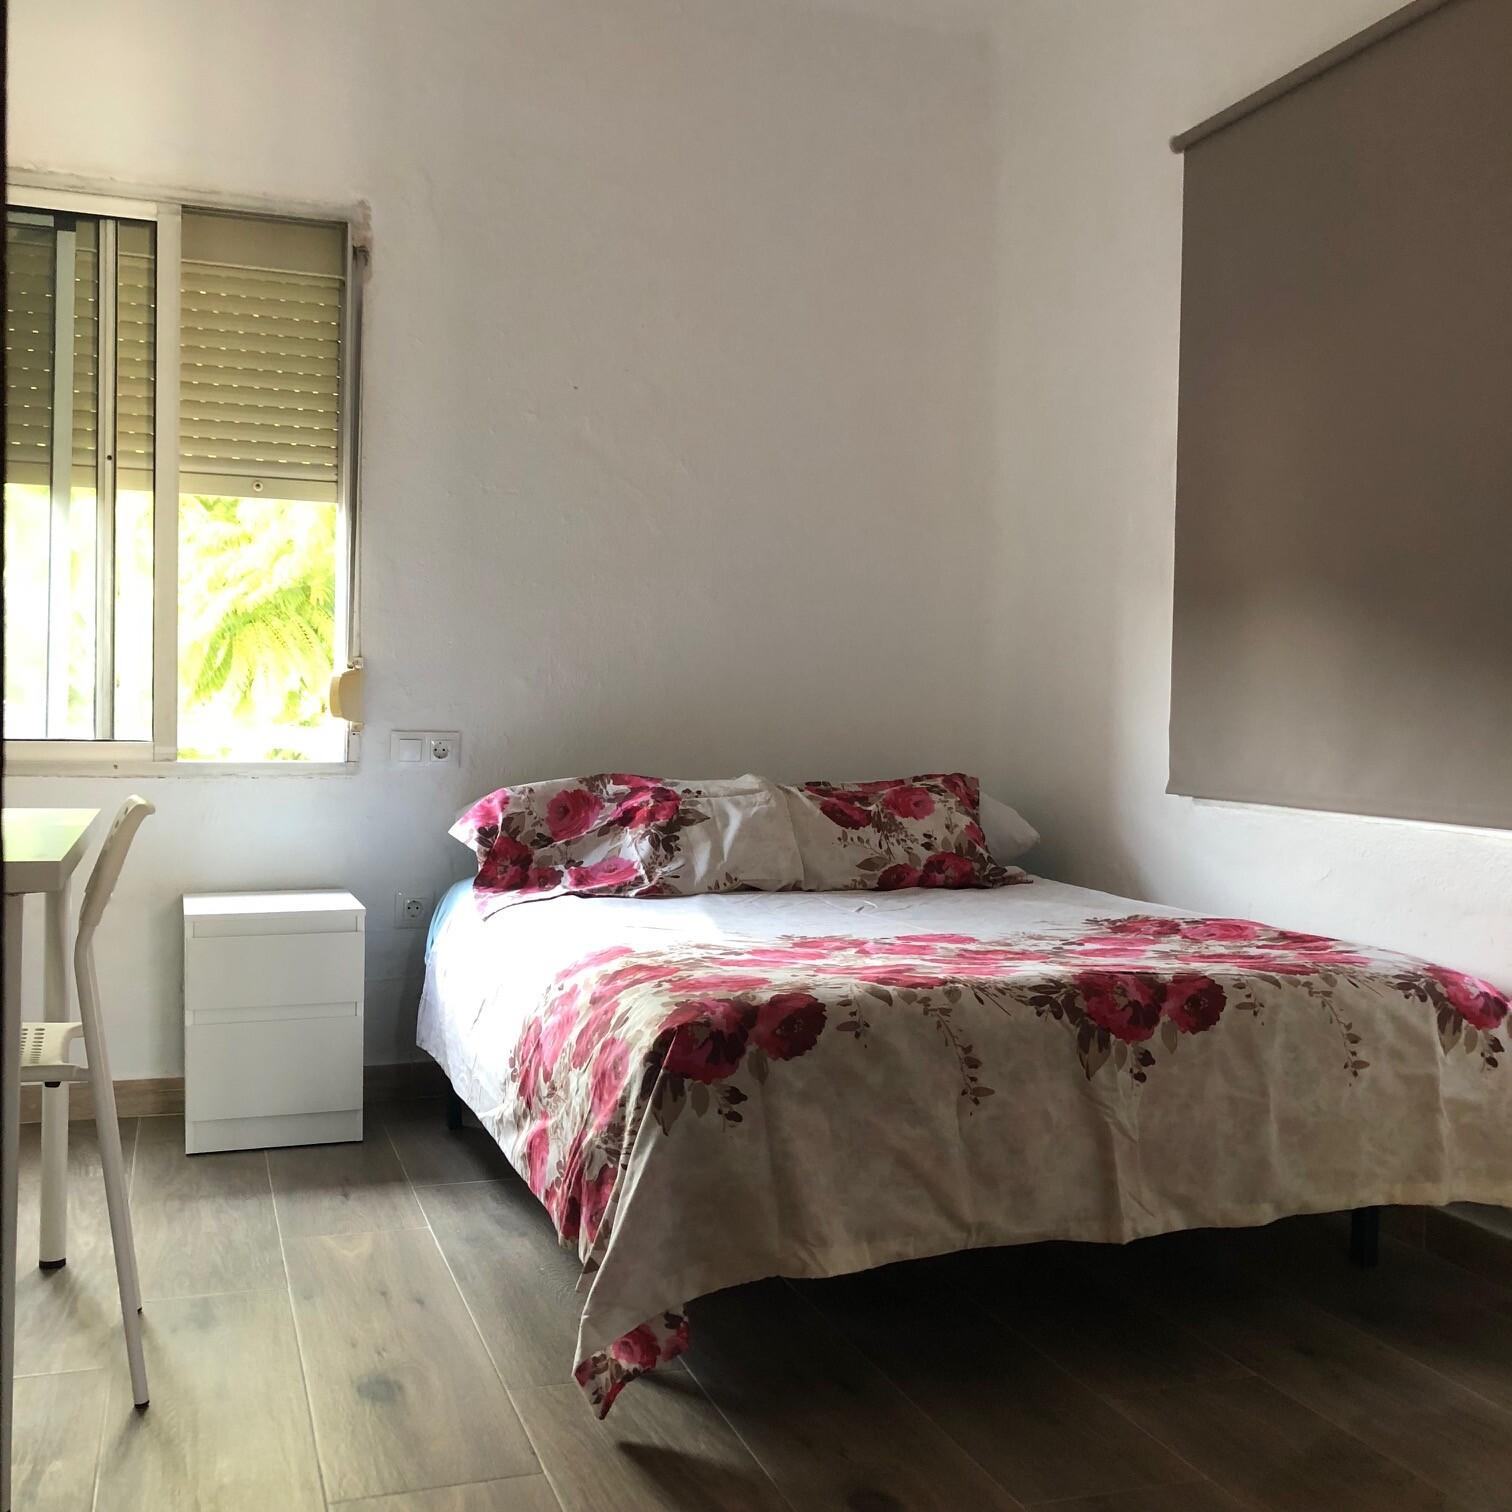 Habitacion luminosa y amplia con cama de matrimoni